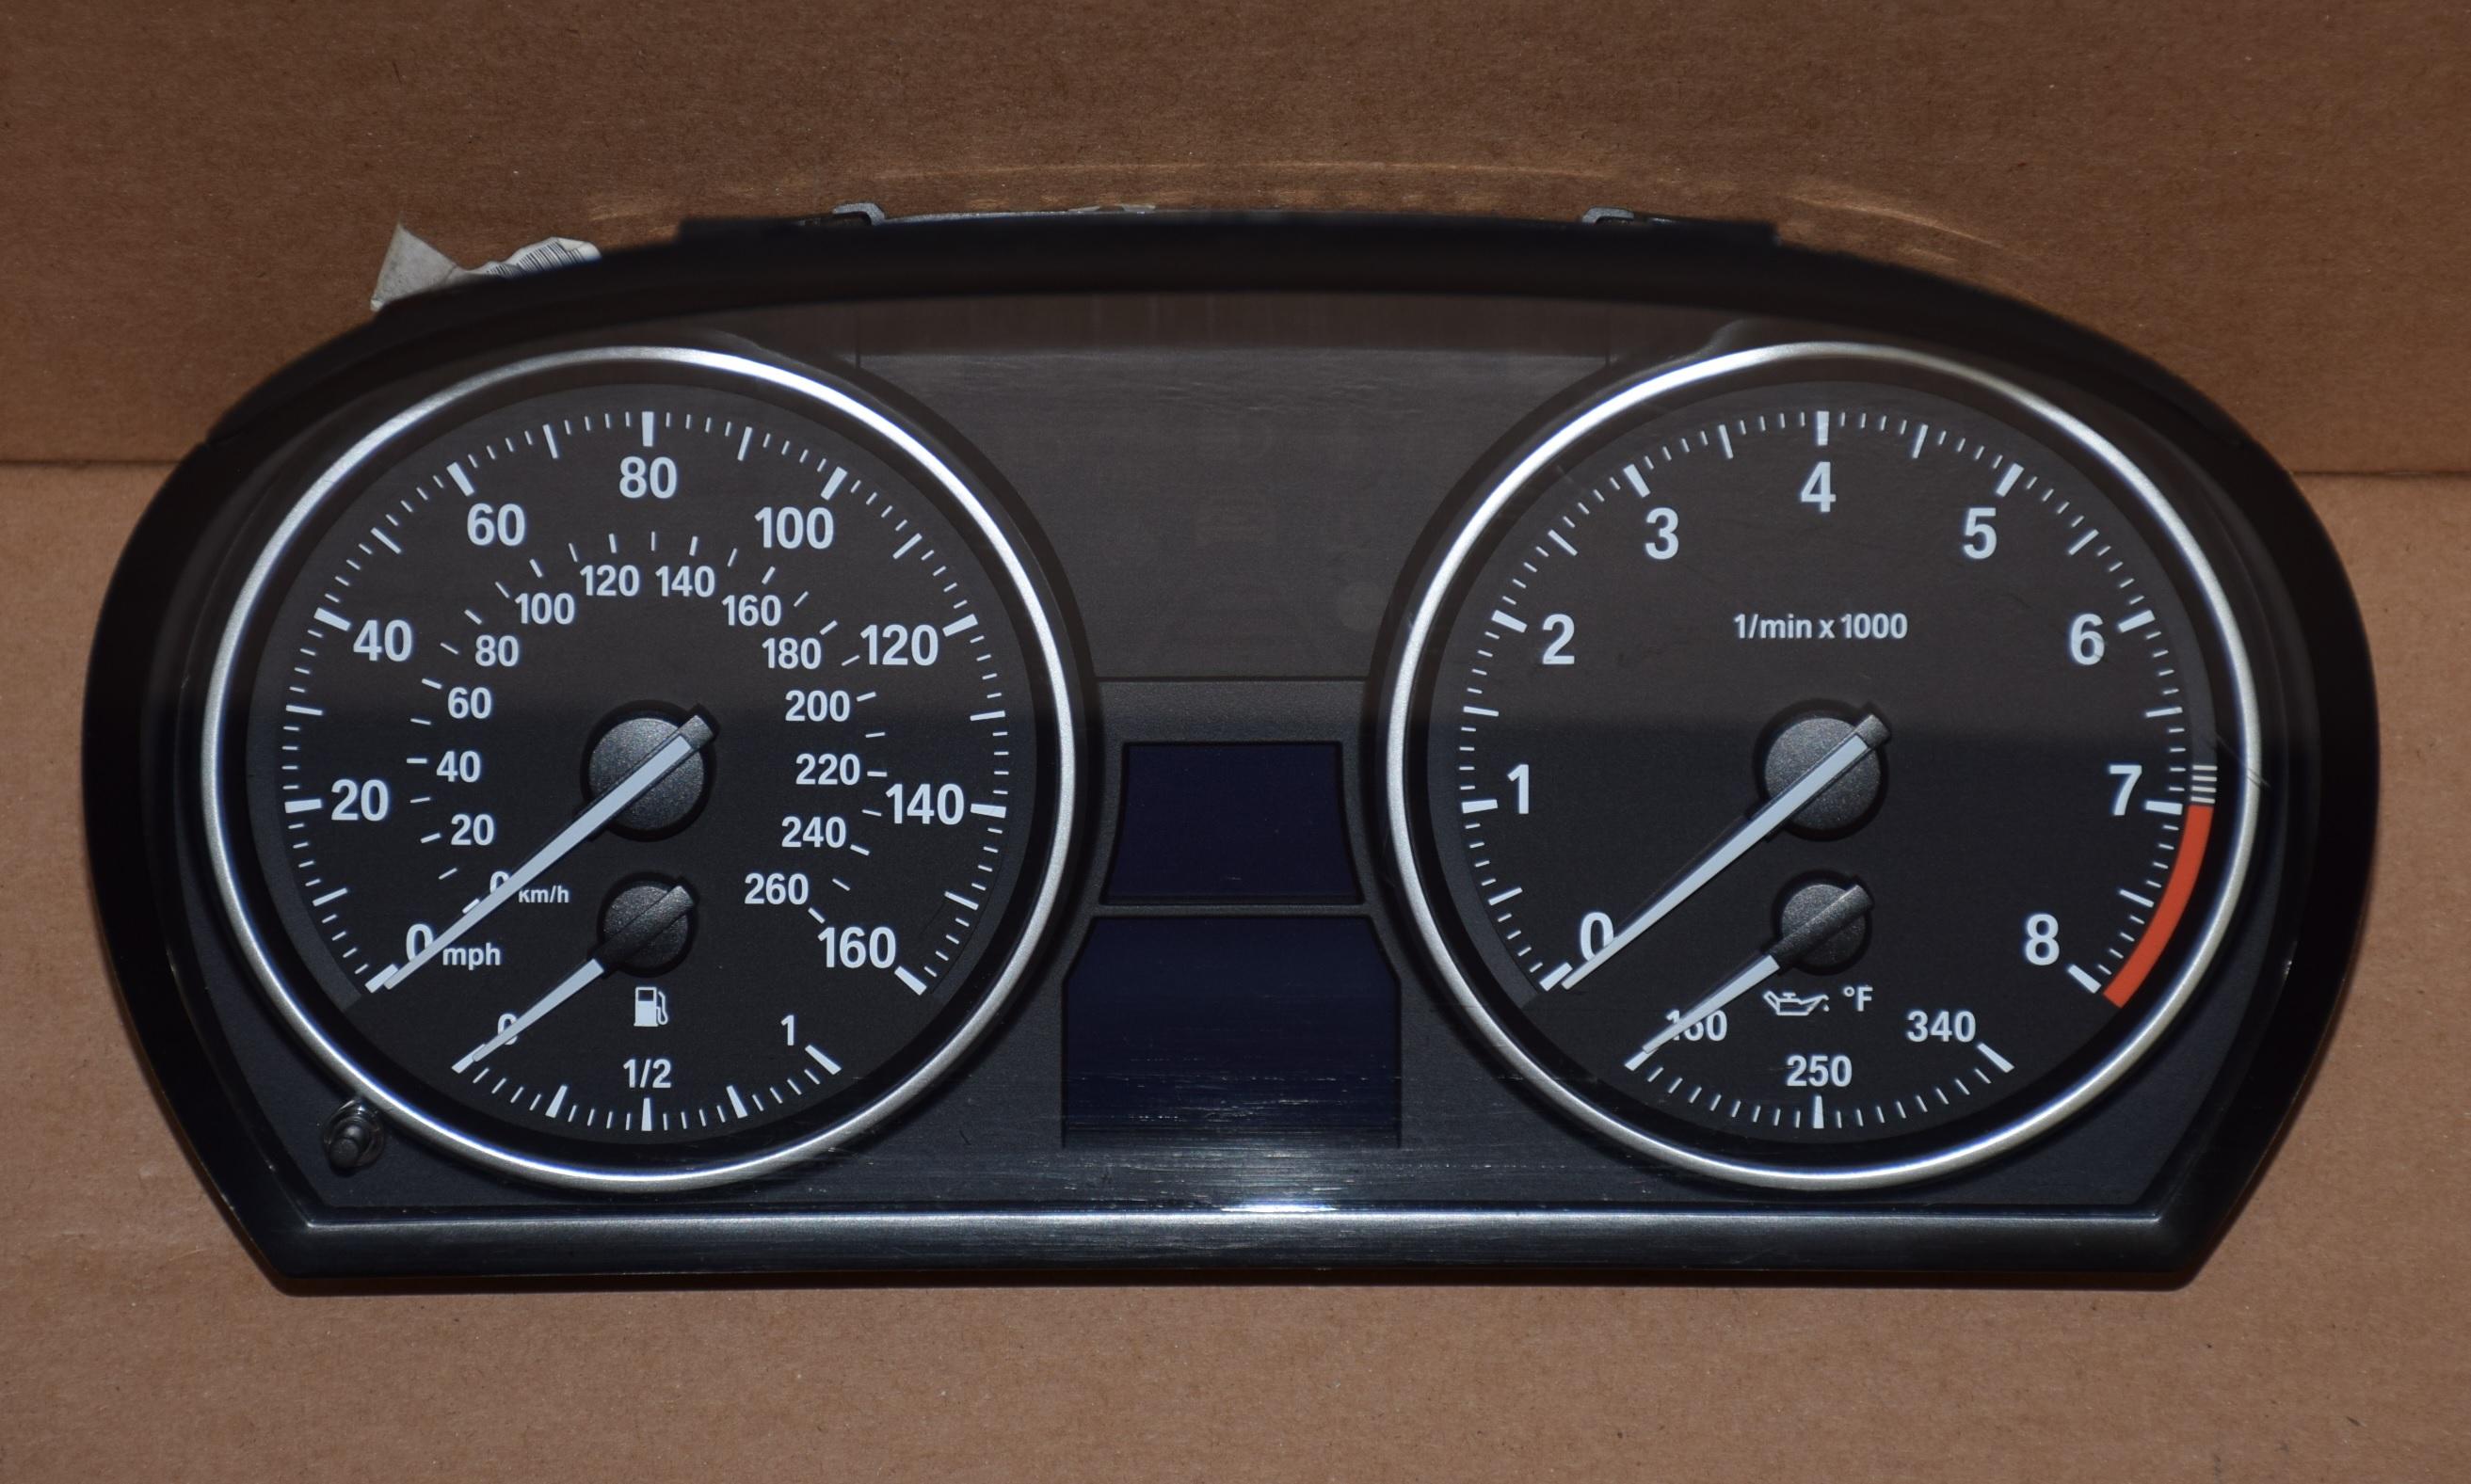 2007-2011 BMW 328I, 335I, E52, E50 USED DASHBOARD INSTRUMENT CLUSTER FOR  SALE (MPH)